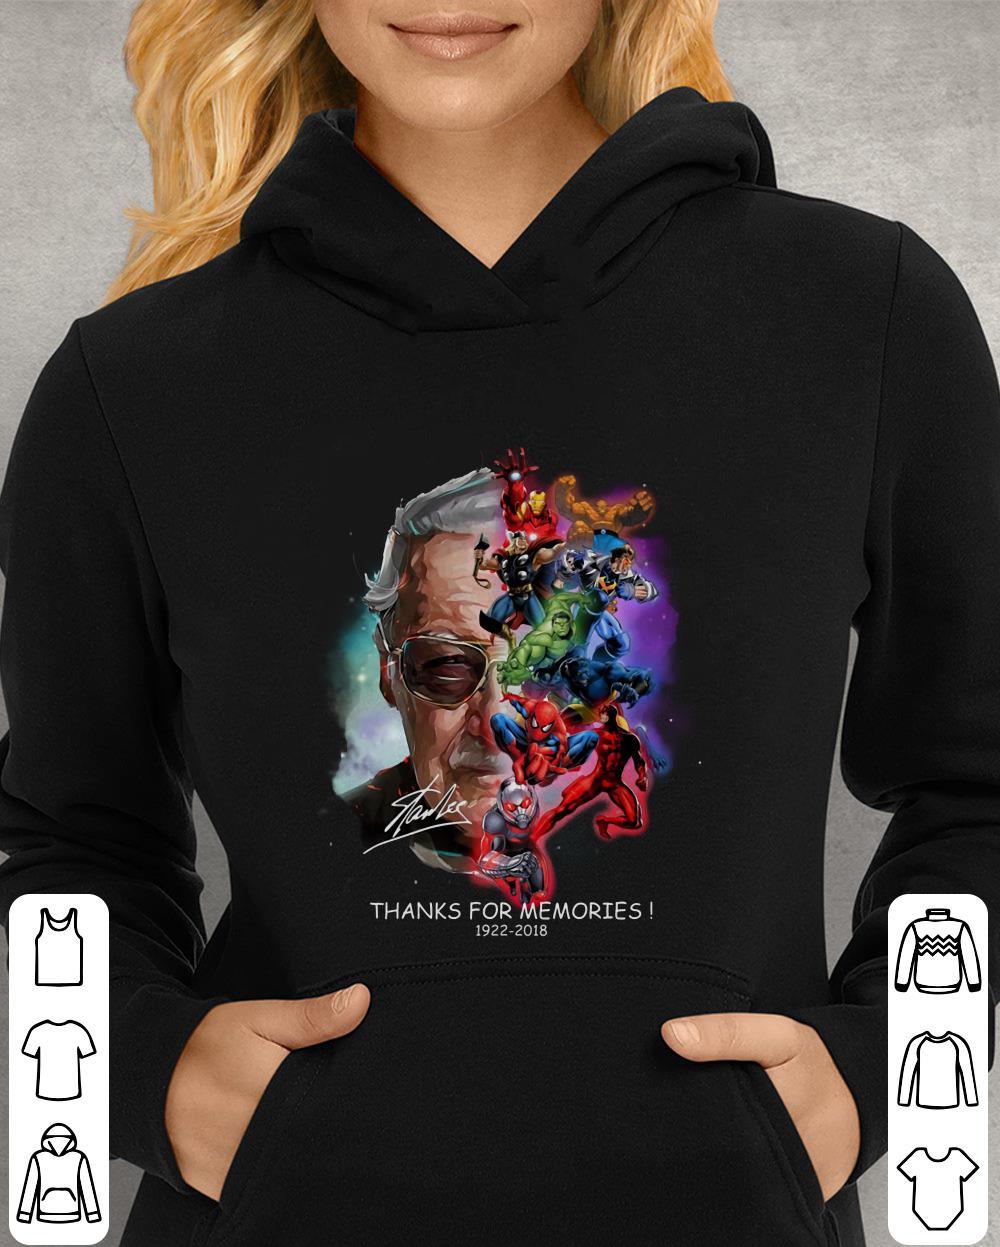 https://unicornshirts.net/images/2018/11/Stan-Lee-Father-Of-Marvel-shirt_4.jpg